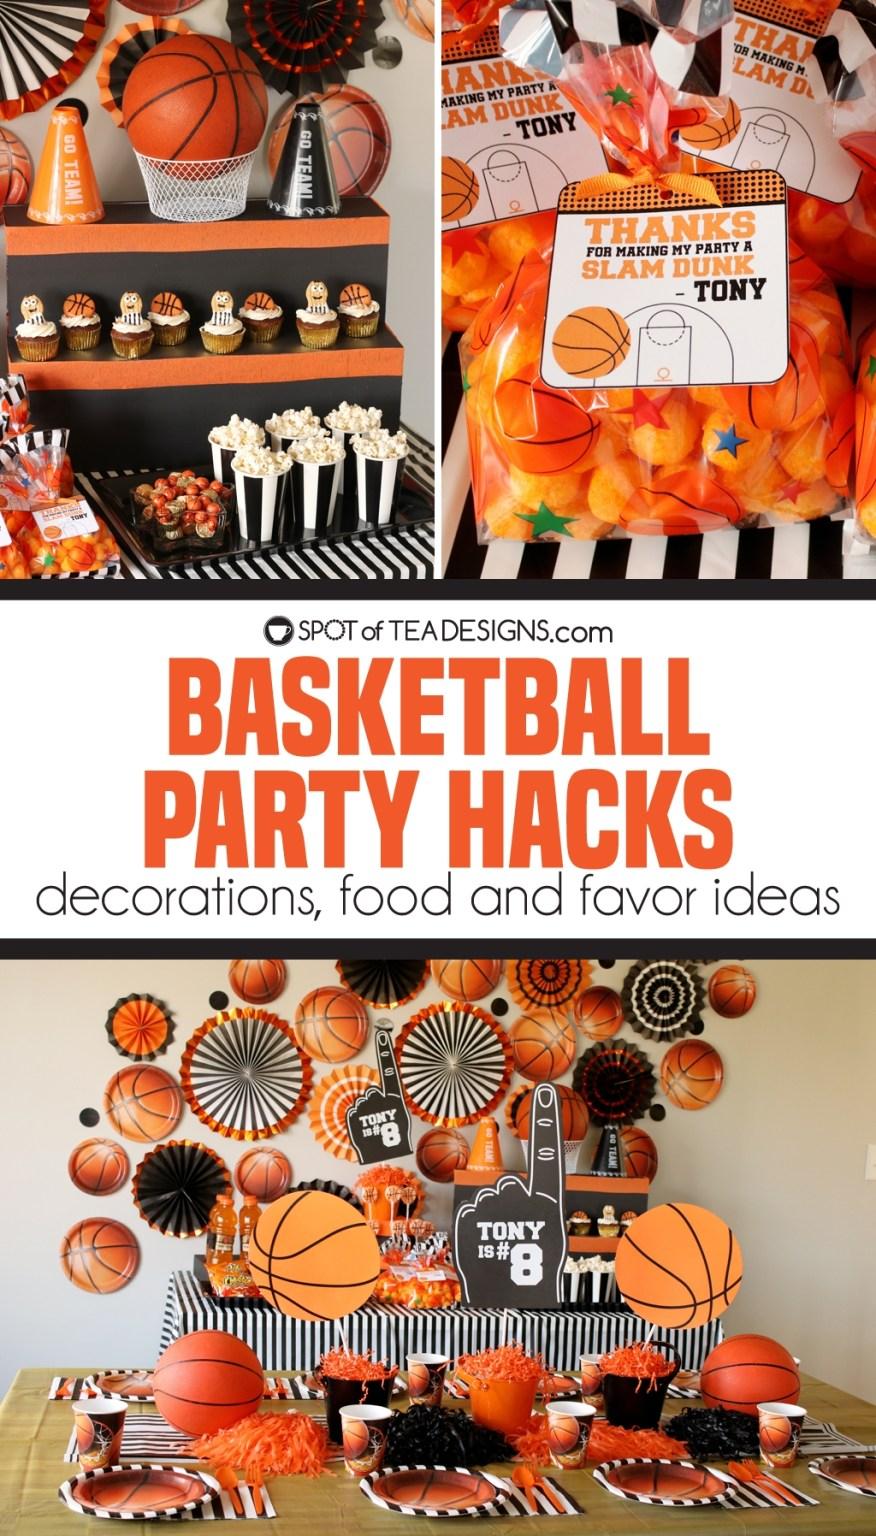 Basketball party hacks | spotofteadesigns.com